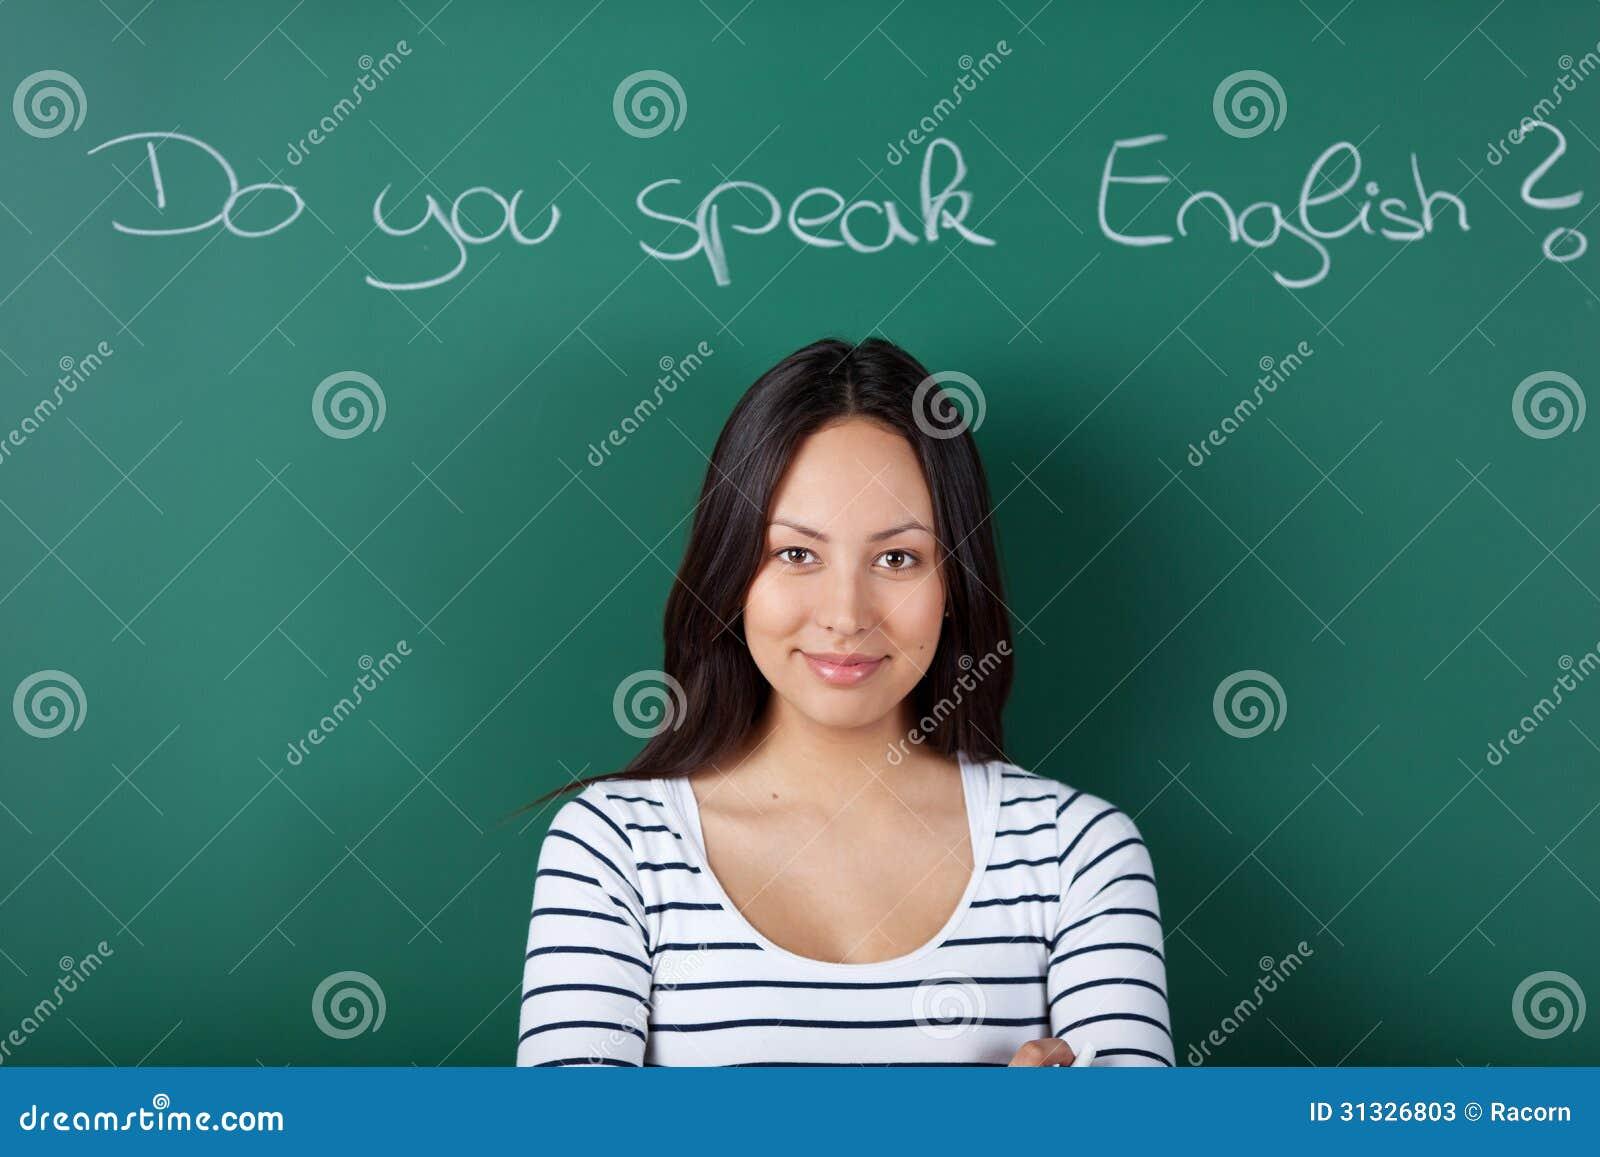 Classroom Based Web Design Course ~ Female student learning english stock photos image